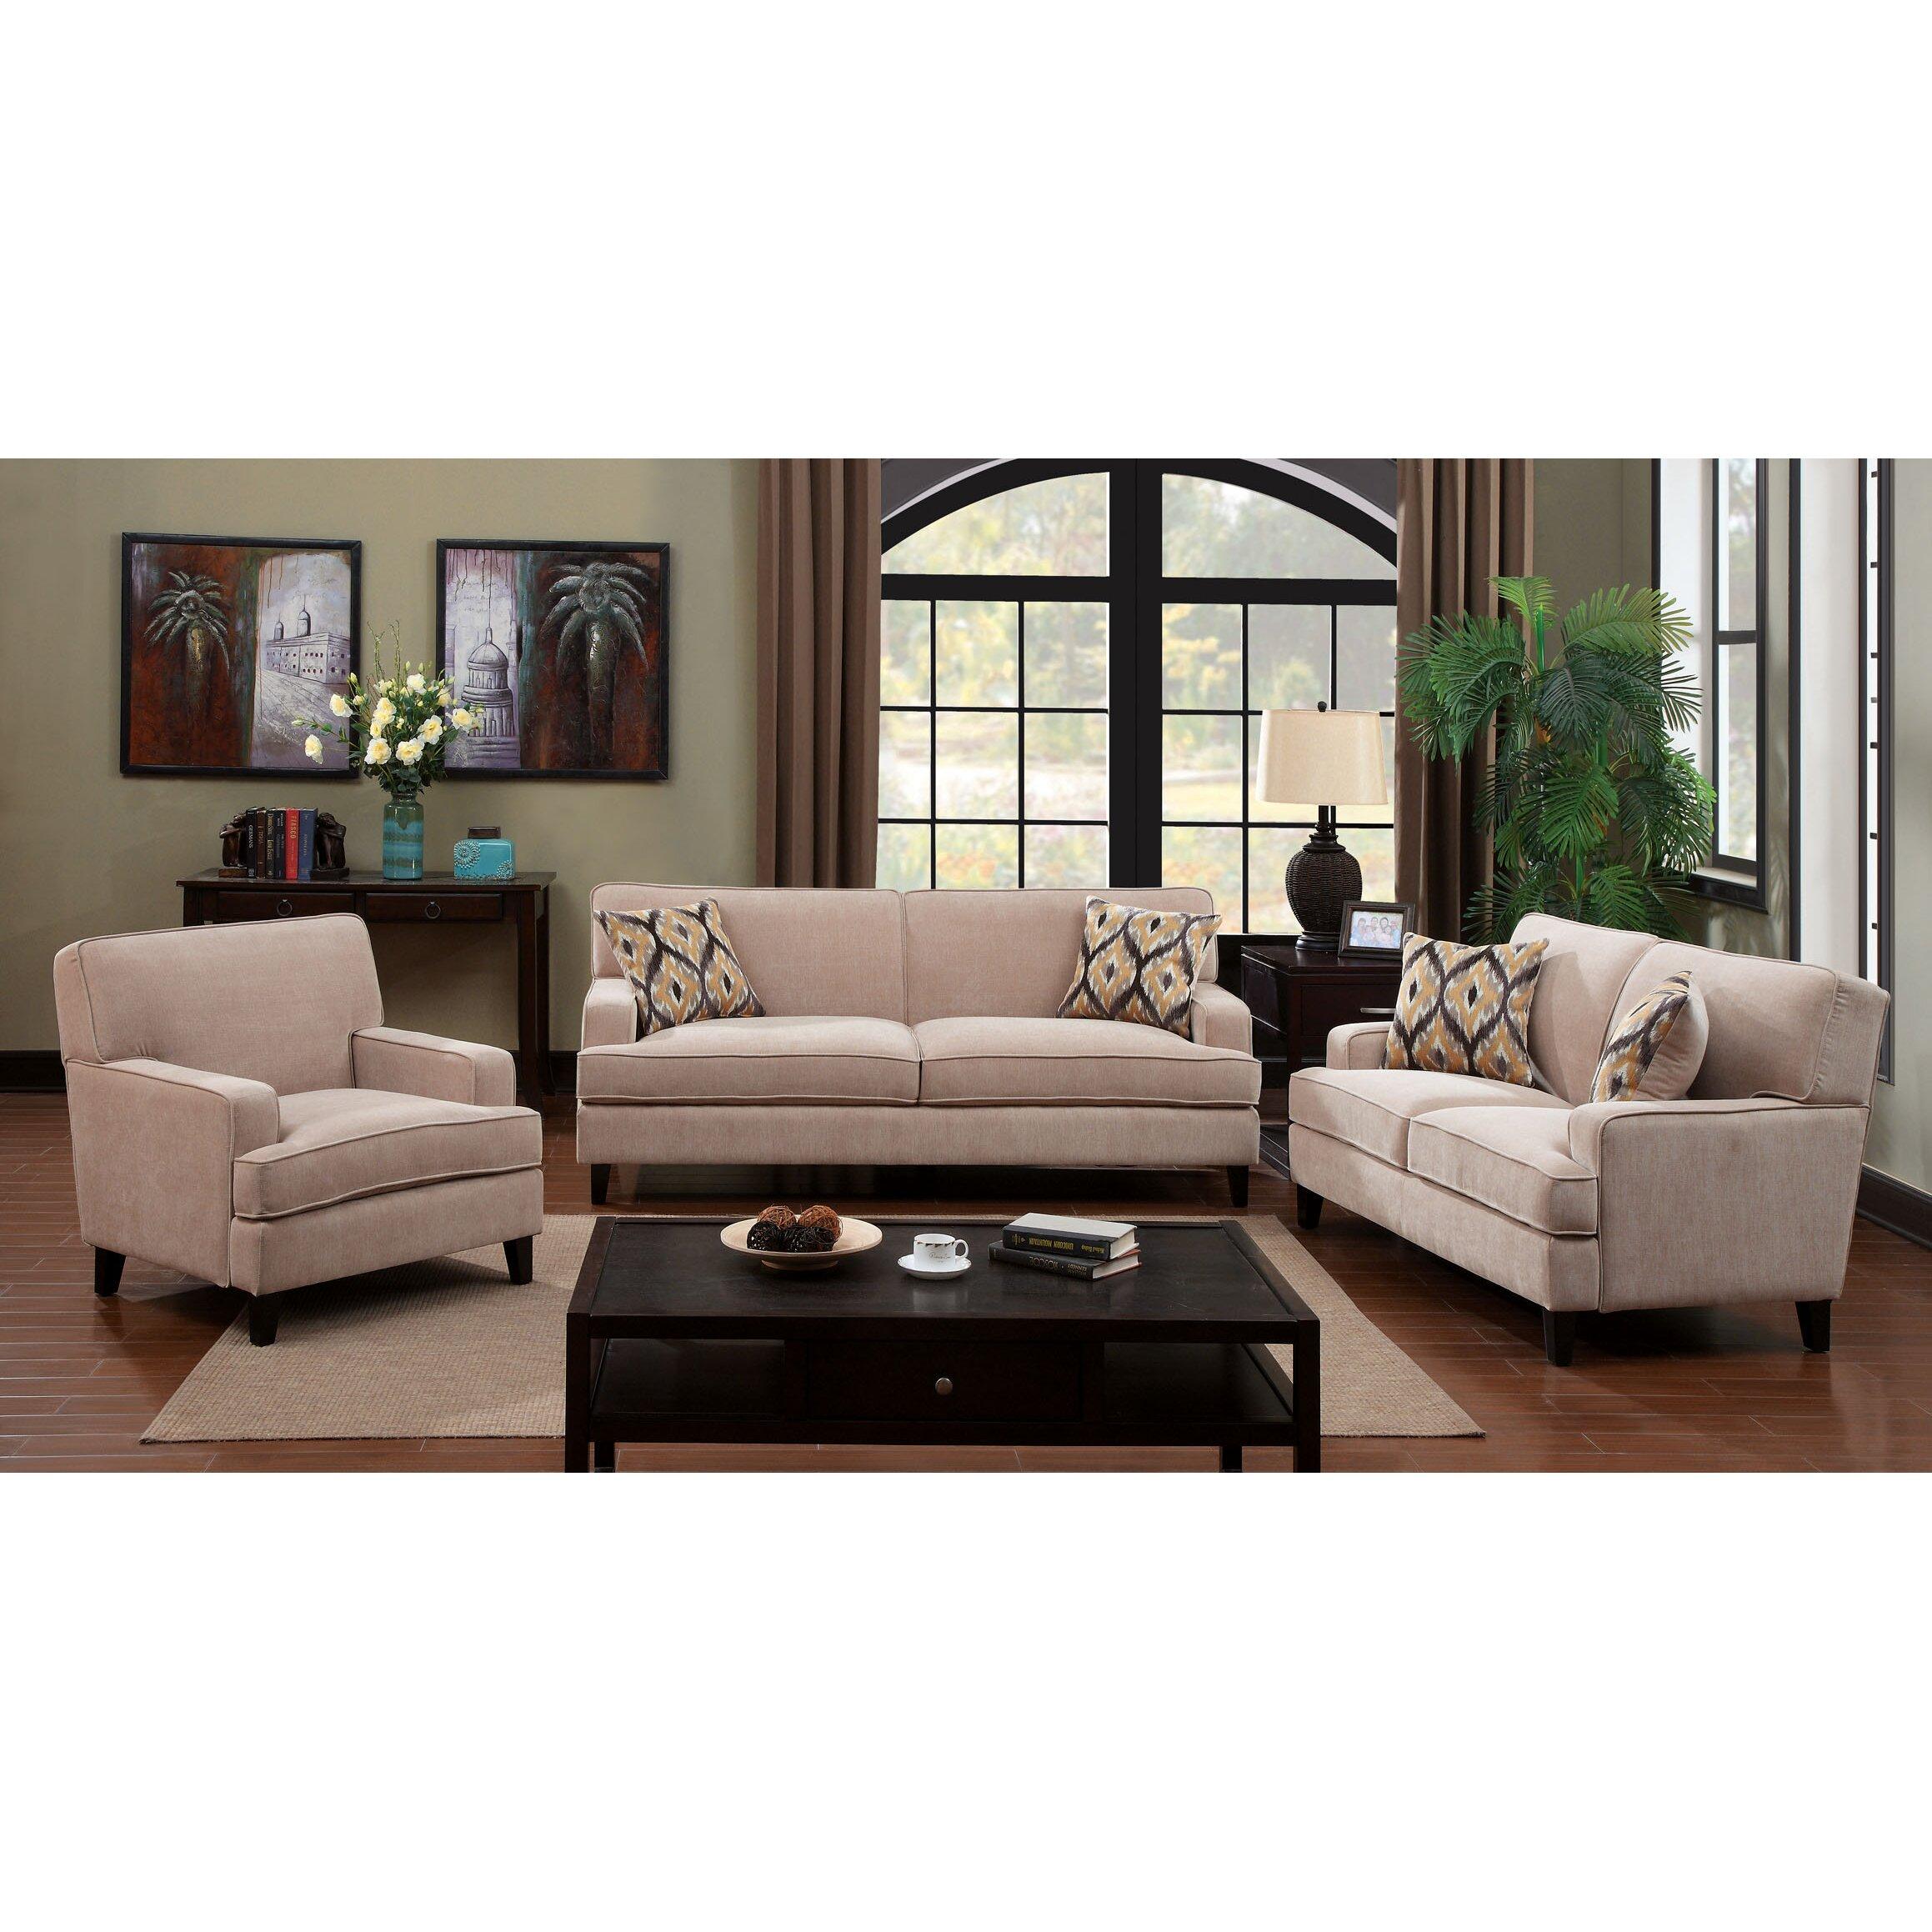 Hokku designs leyna modern standard loveseat reviews for Hokku designs living room furniture